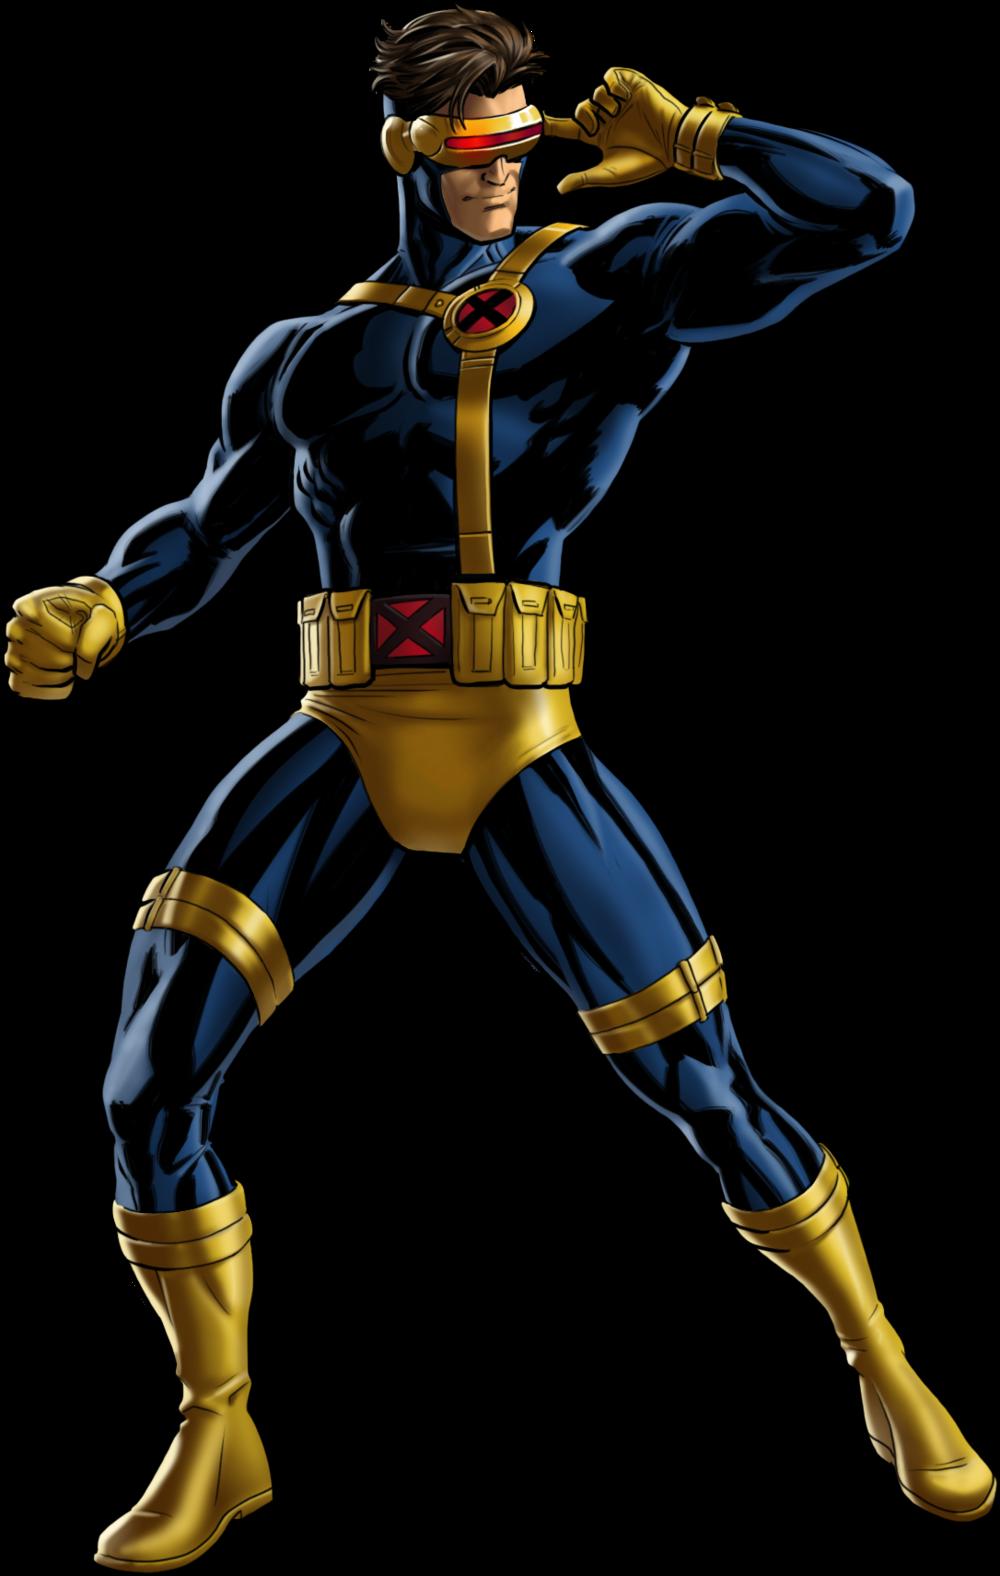 Cyclops Marvel Avengers Alliance Cyclops Marvel Hulk Marvel